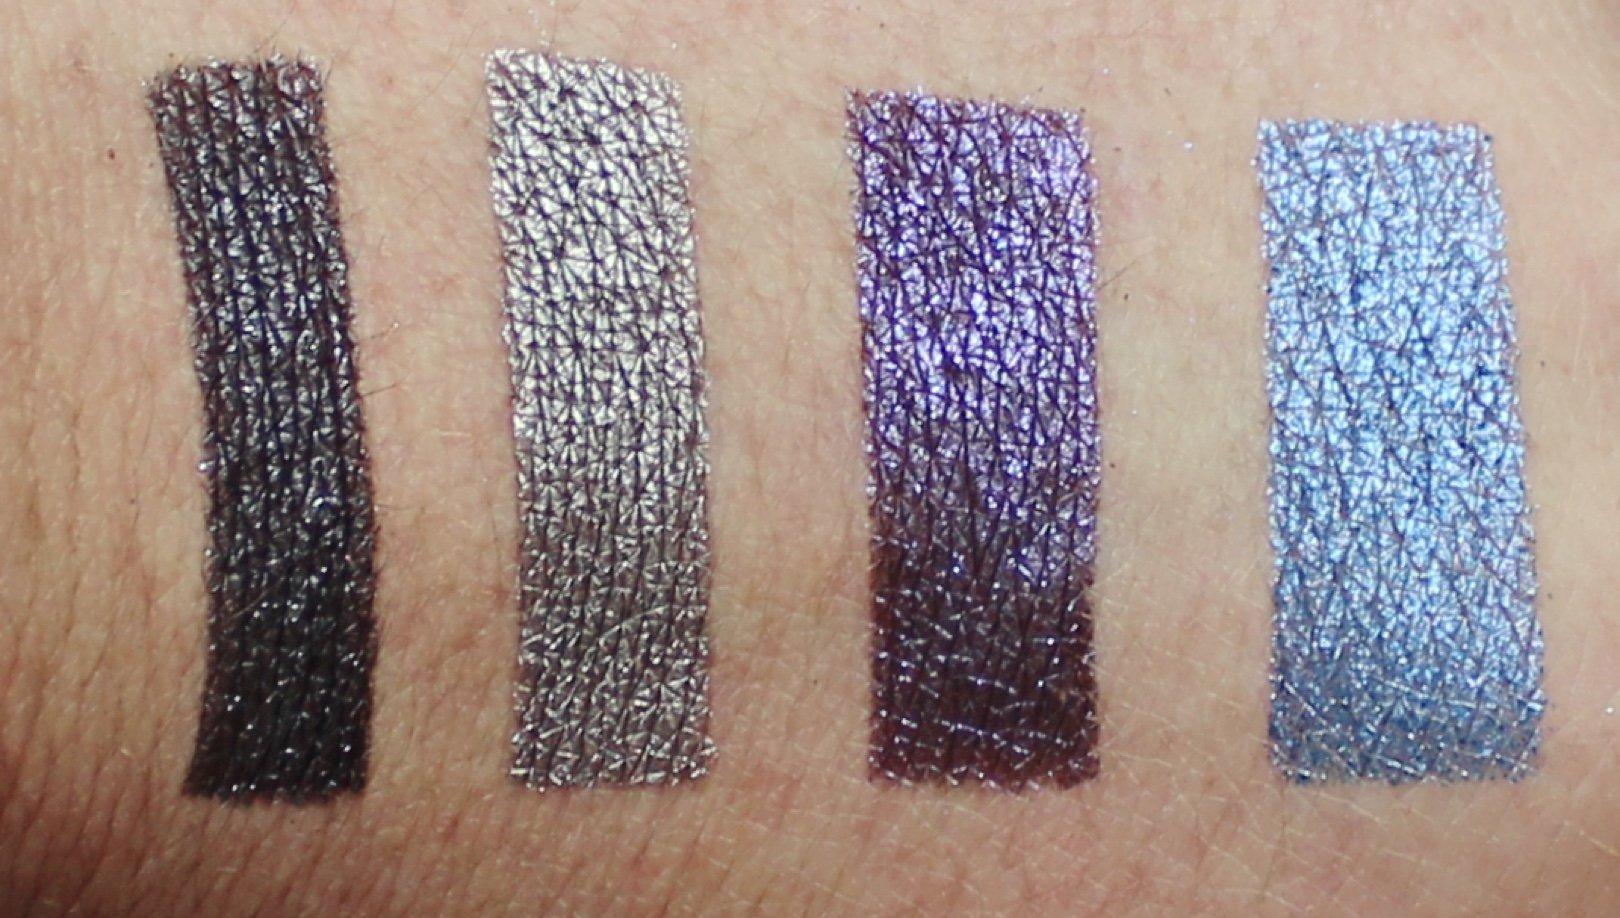 Urban Decay Heavy Metals Metallic Eyeshadow Palette swatch